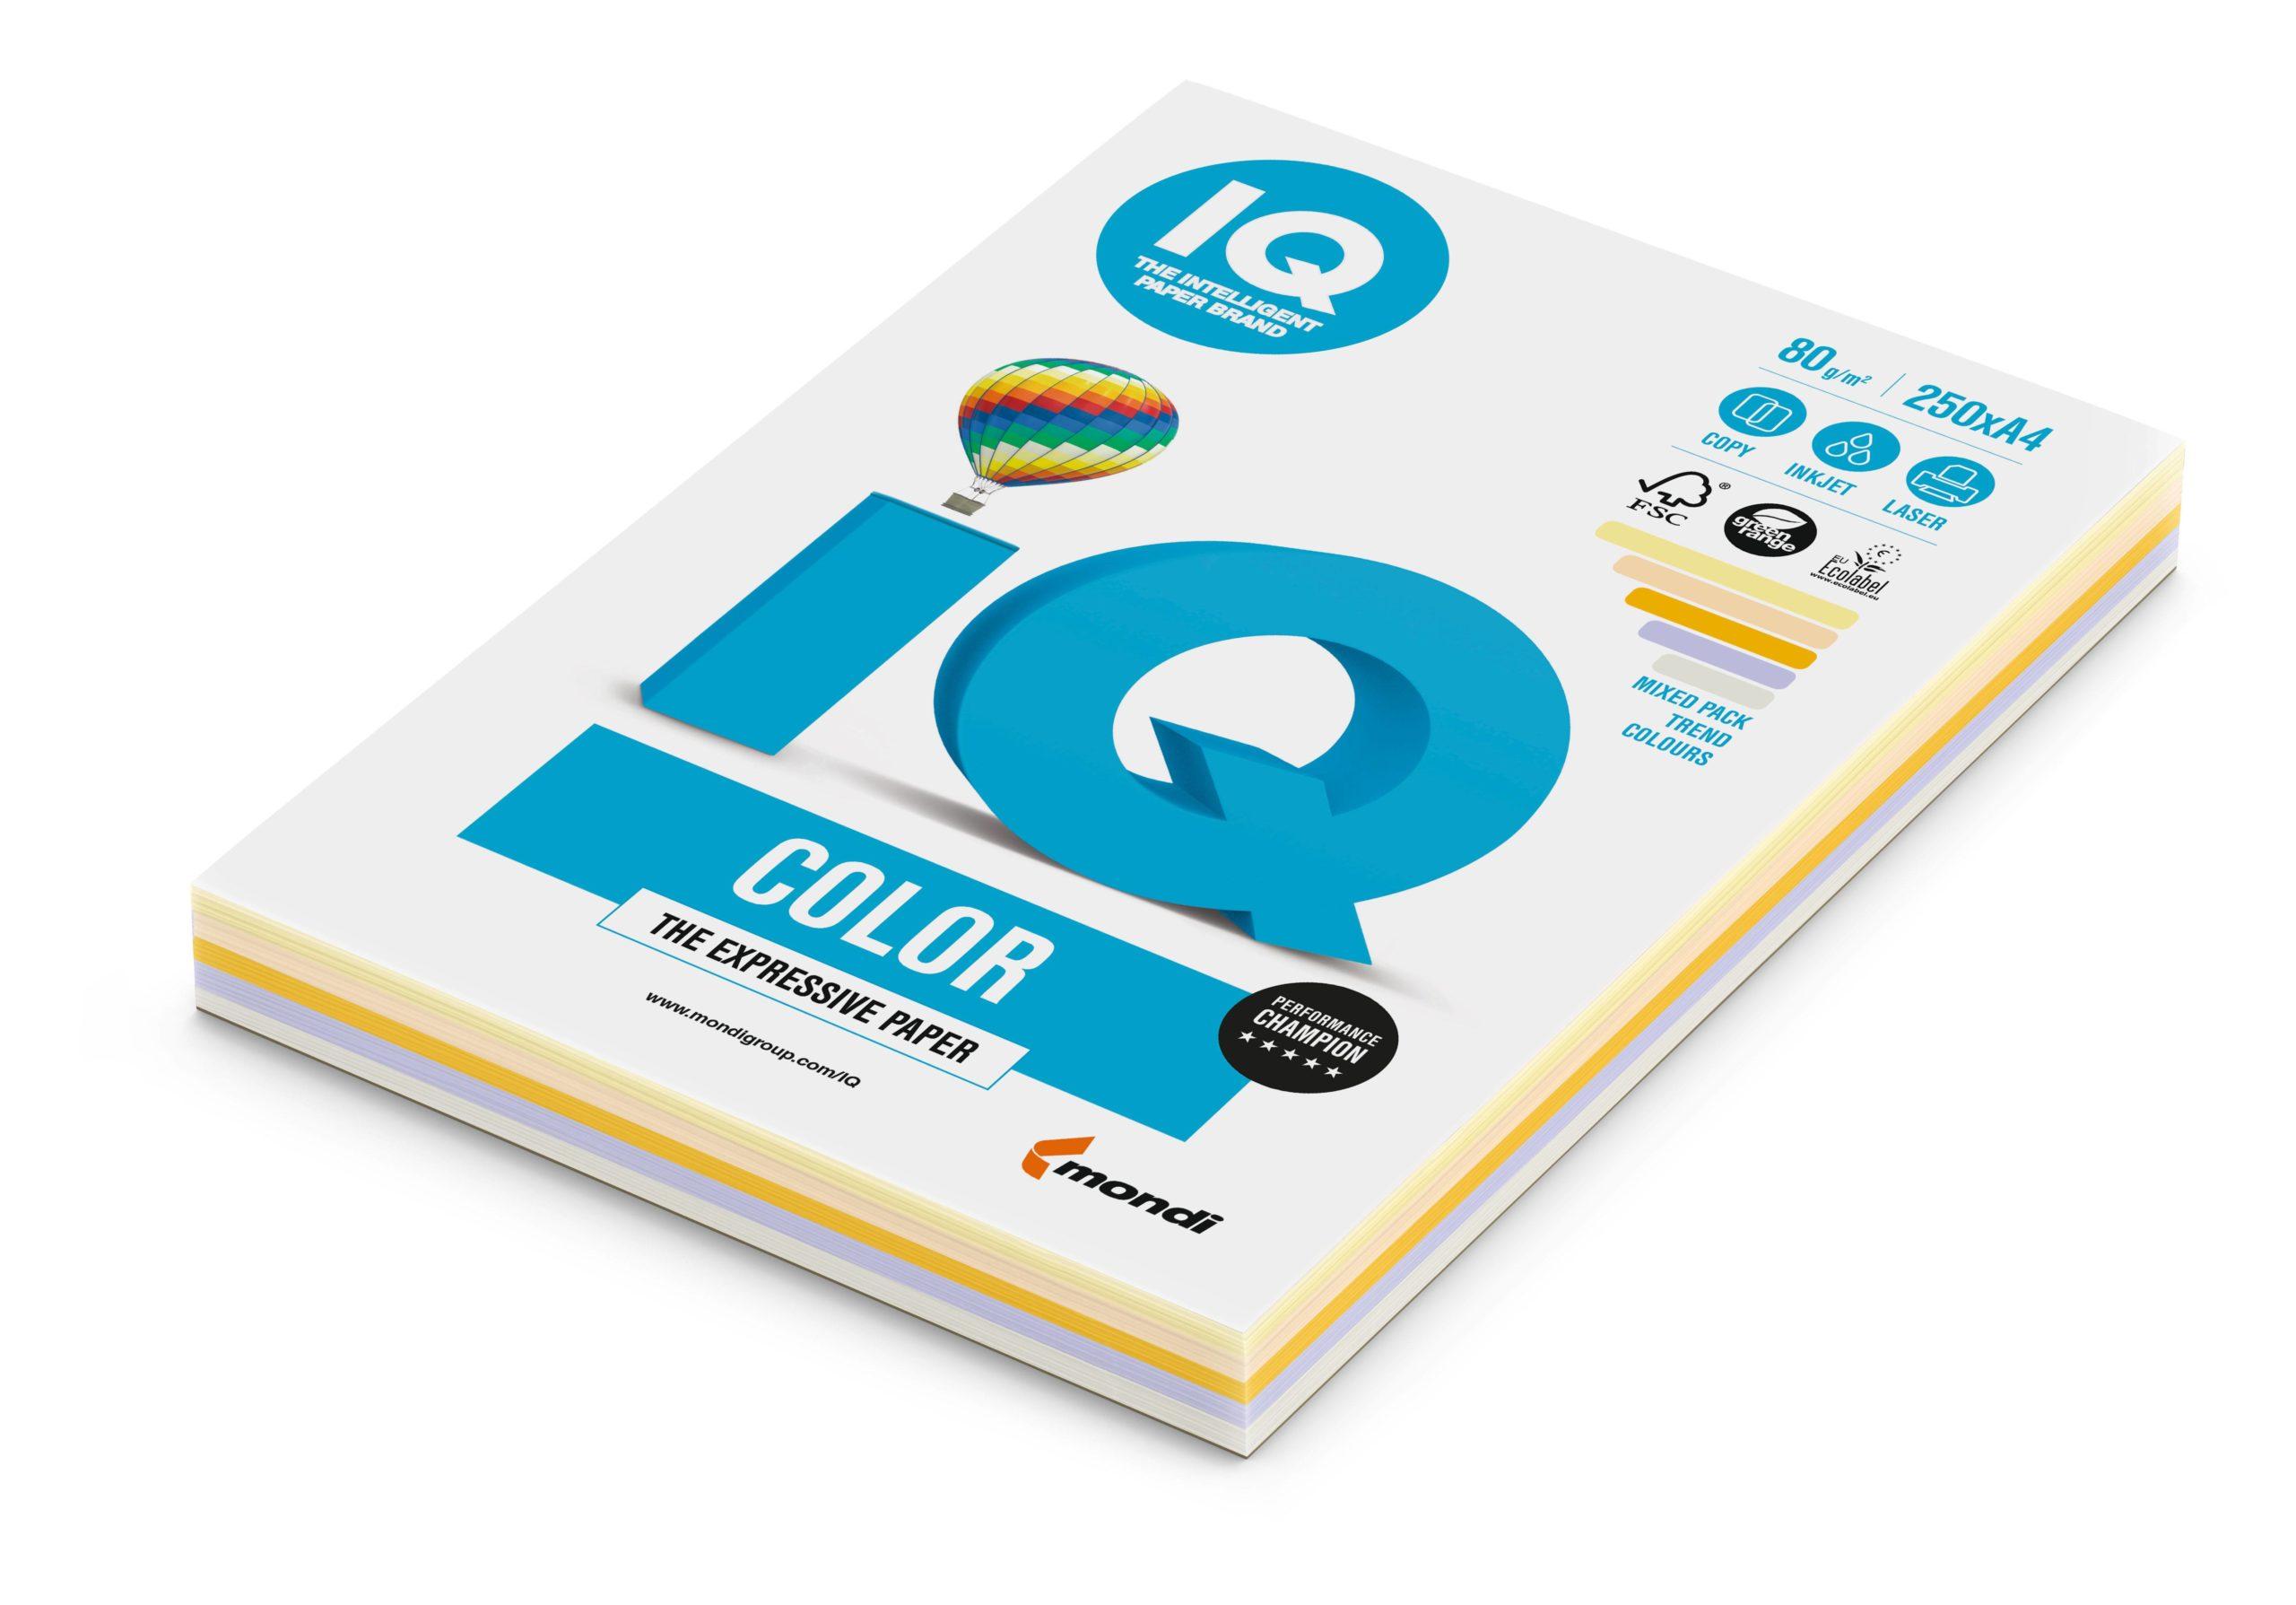 Бумага А4, IQ COLOR MIX, 5 цв., 250 листов, 80 г/м2, тренд